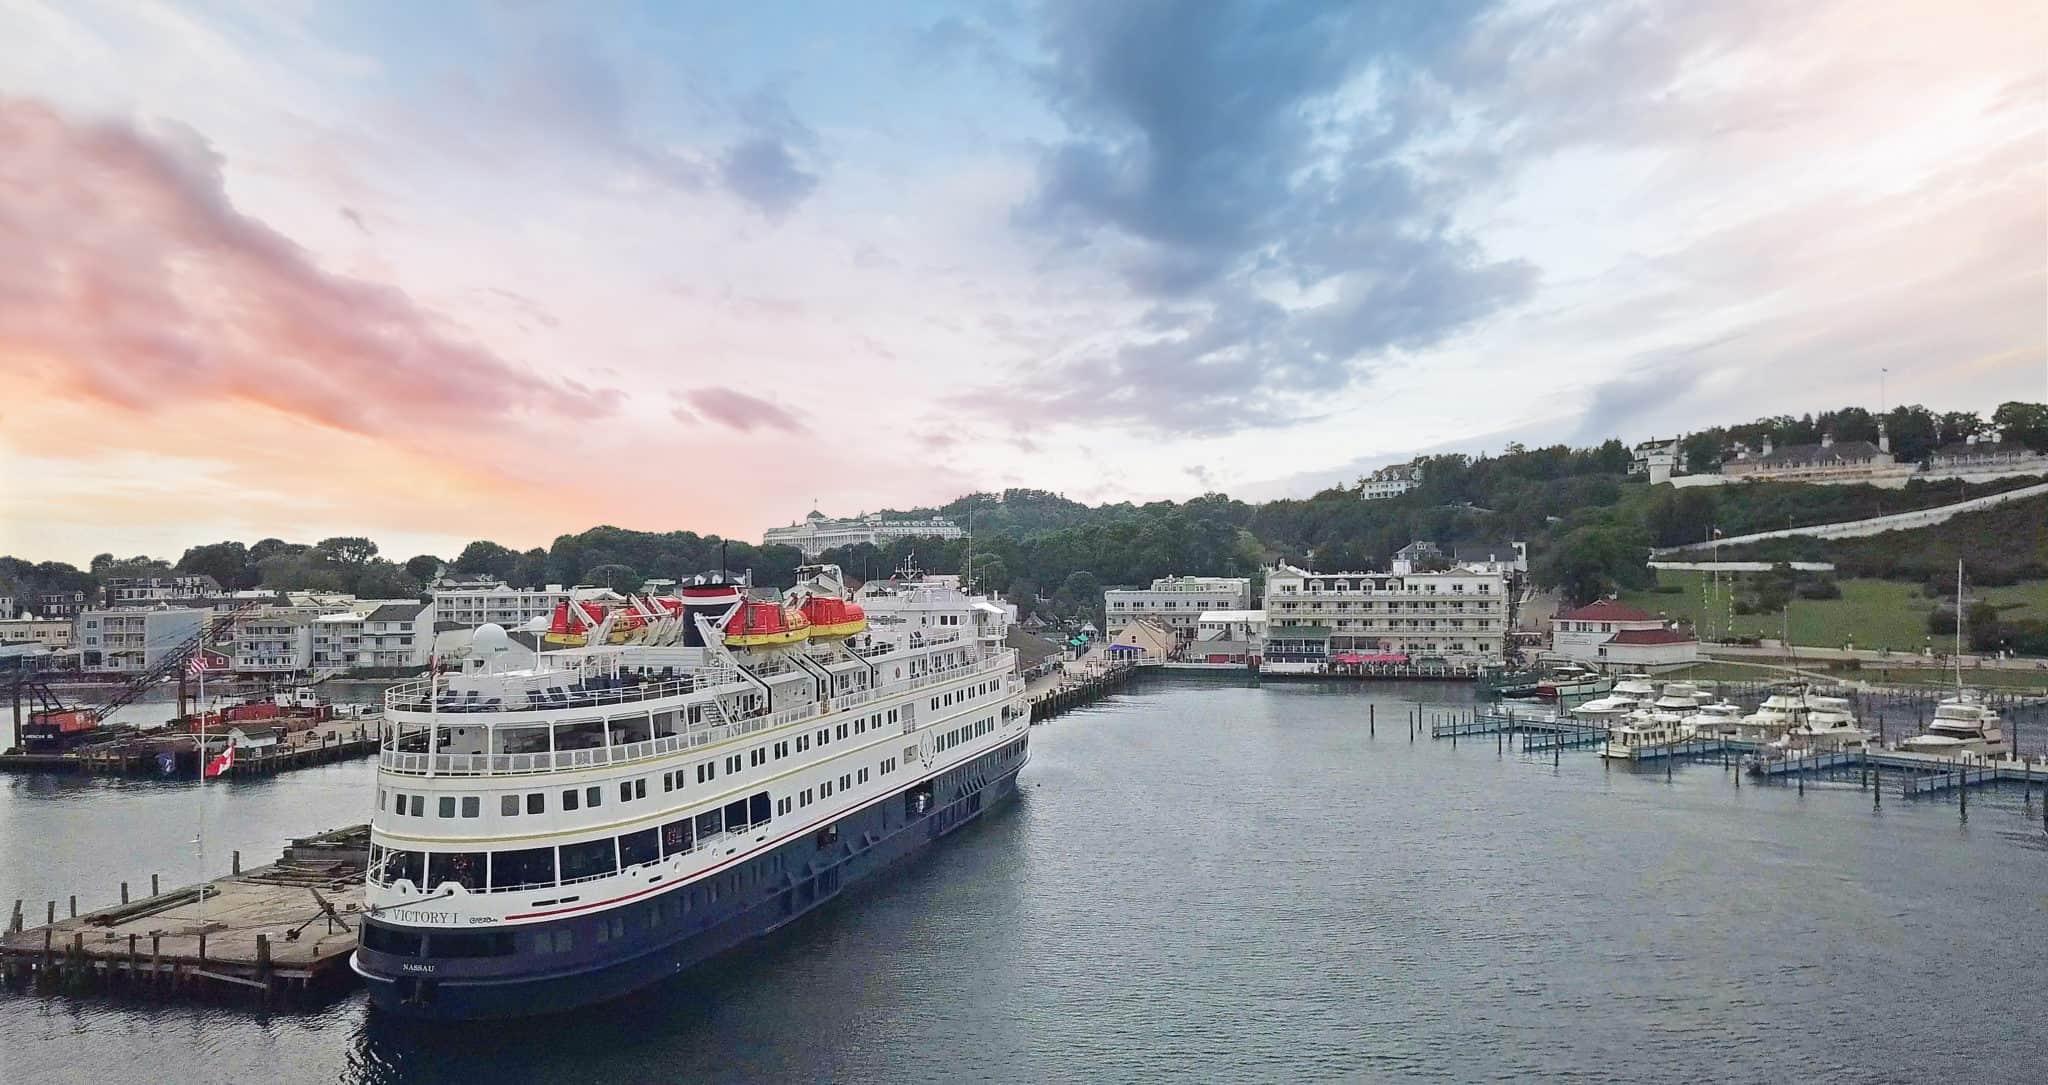 victory II victory cruise lines coastal ship